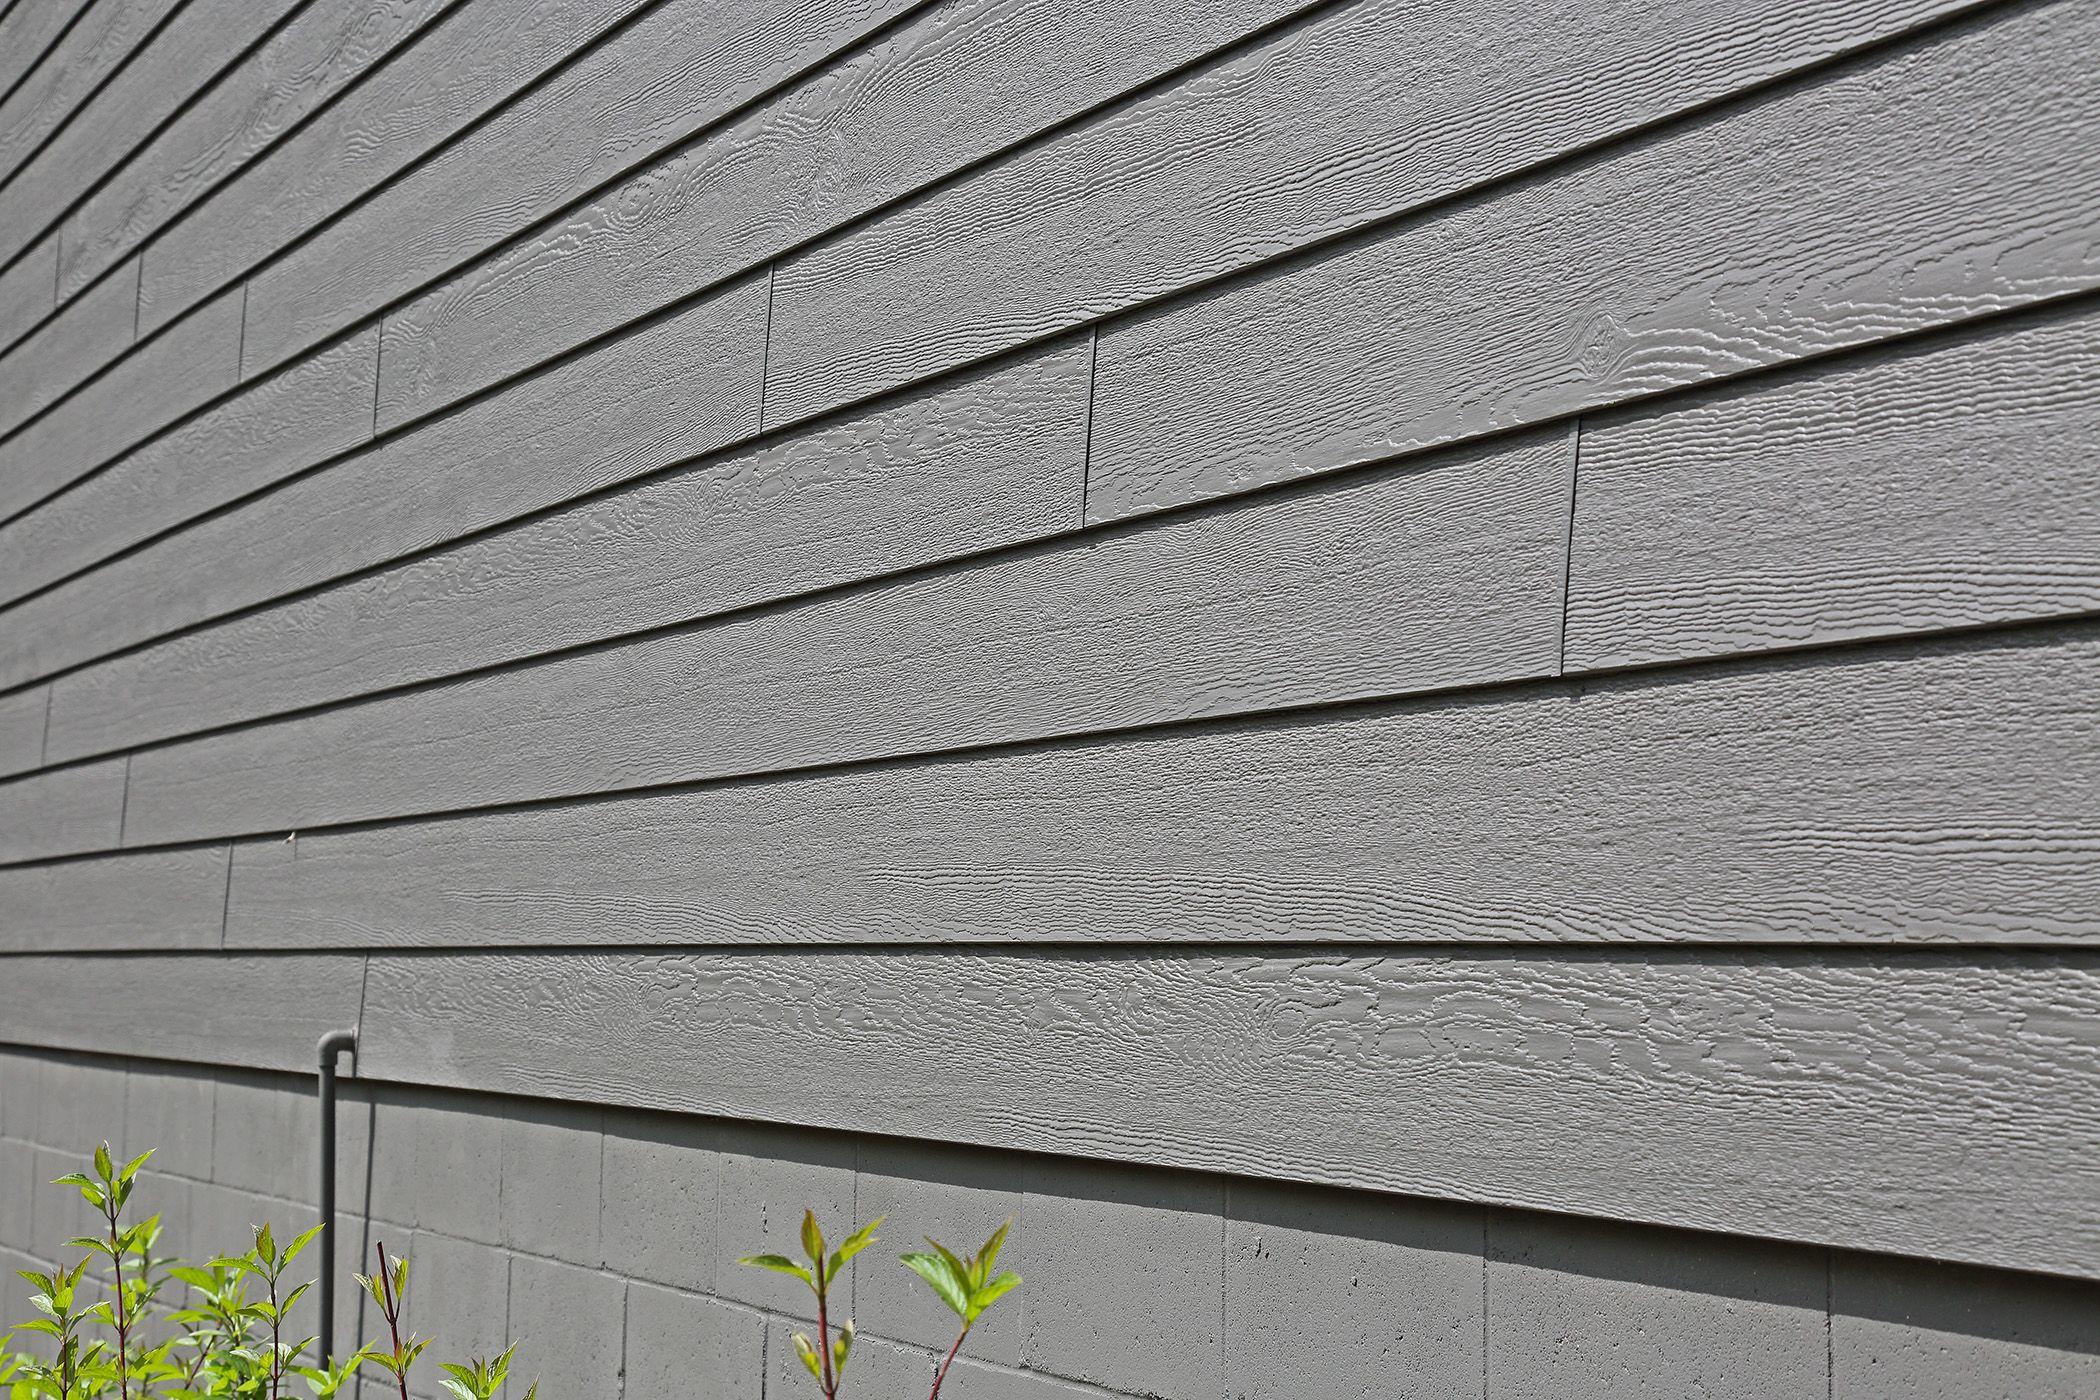 Lp Smartside Siding Misty Shadow Installing Siding Engineered Wood Siding Siding